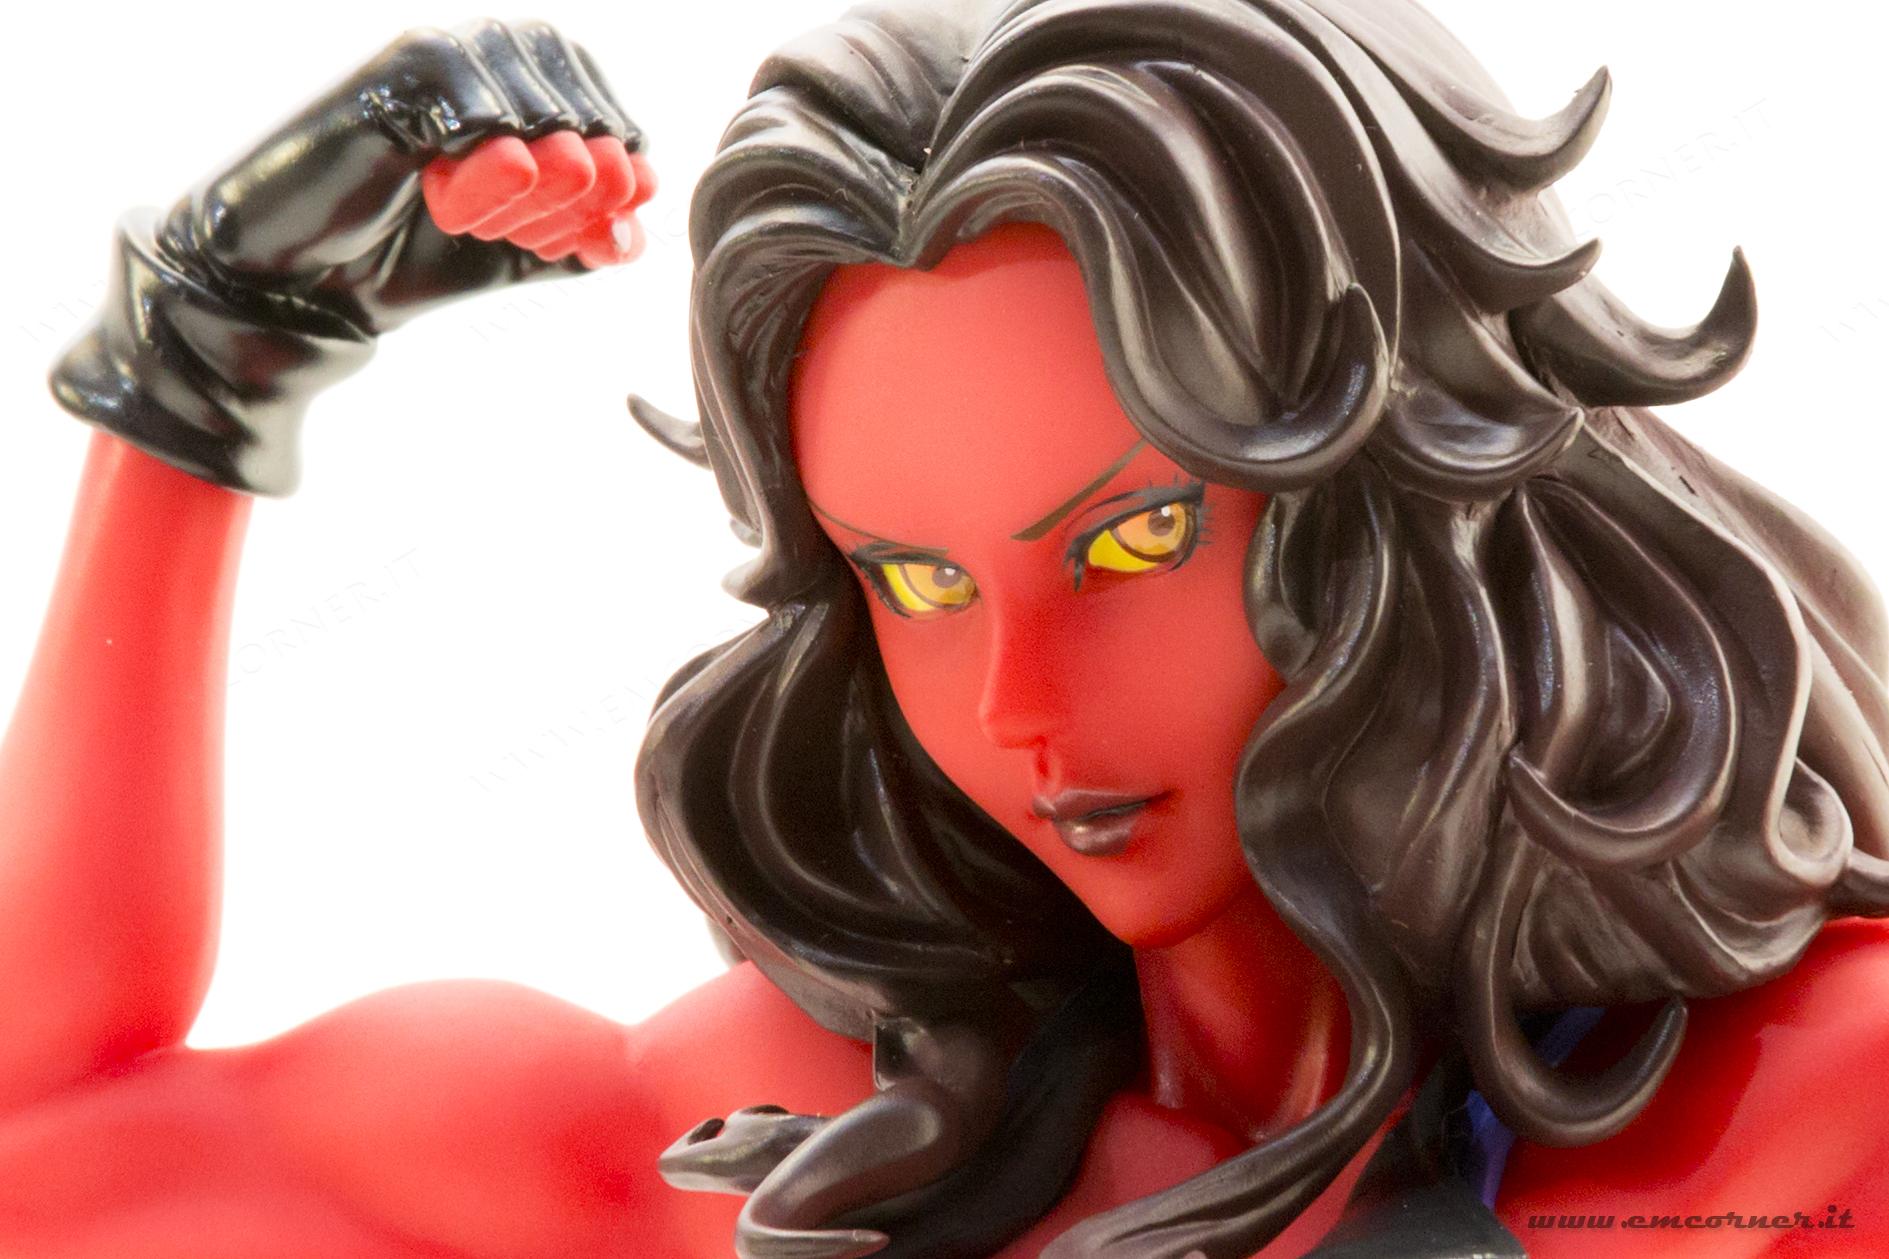 red_she_hul_kotobukiya_bishoujo_emcorner-it_-9